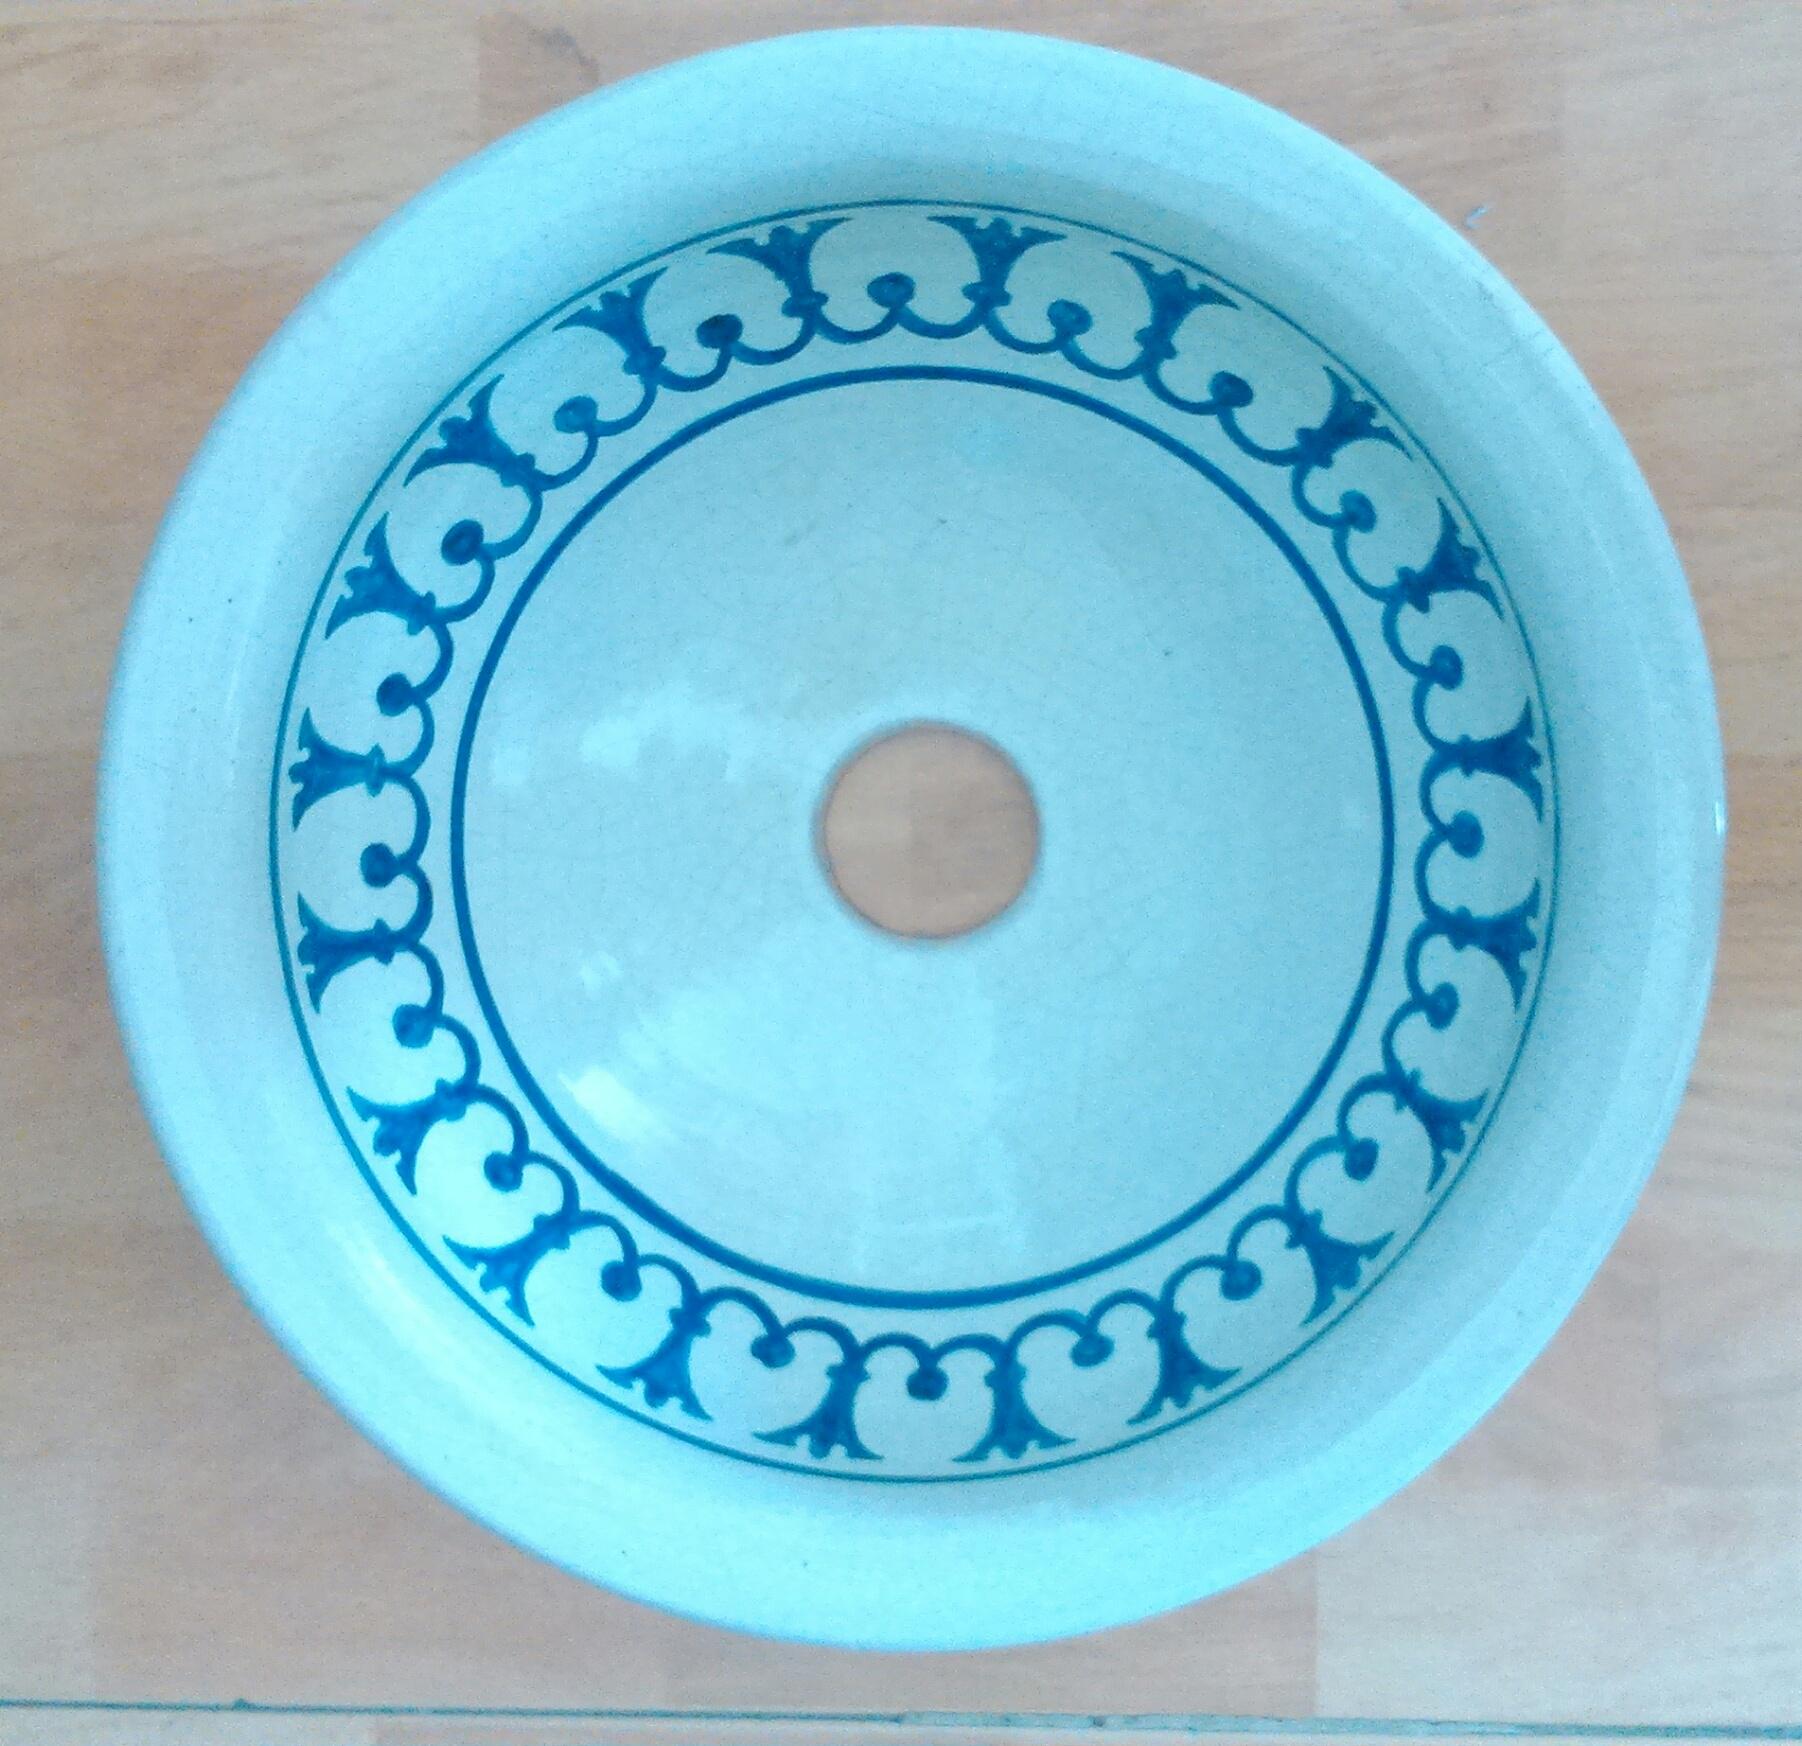 Comprar lavadero fregadero ceramica Lavadero ceramica